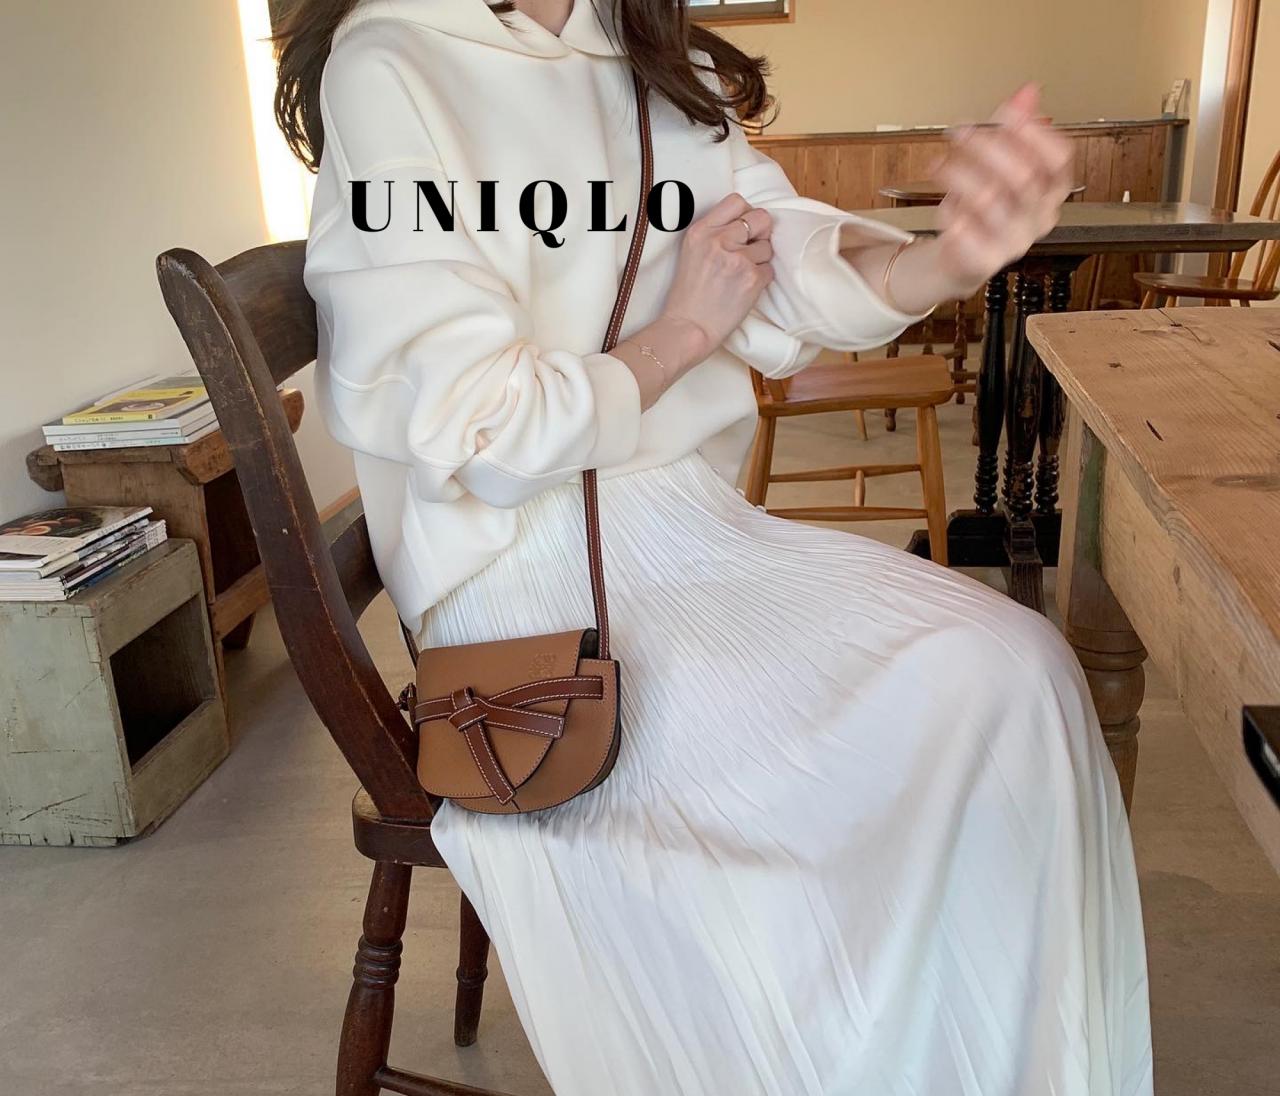 【UNIQLO】今季オススメの購入品